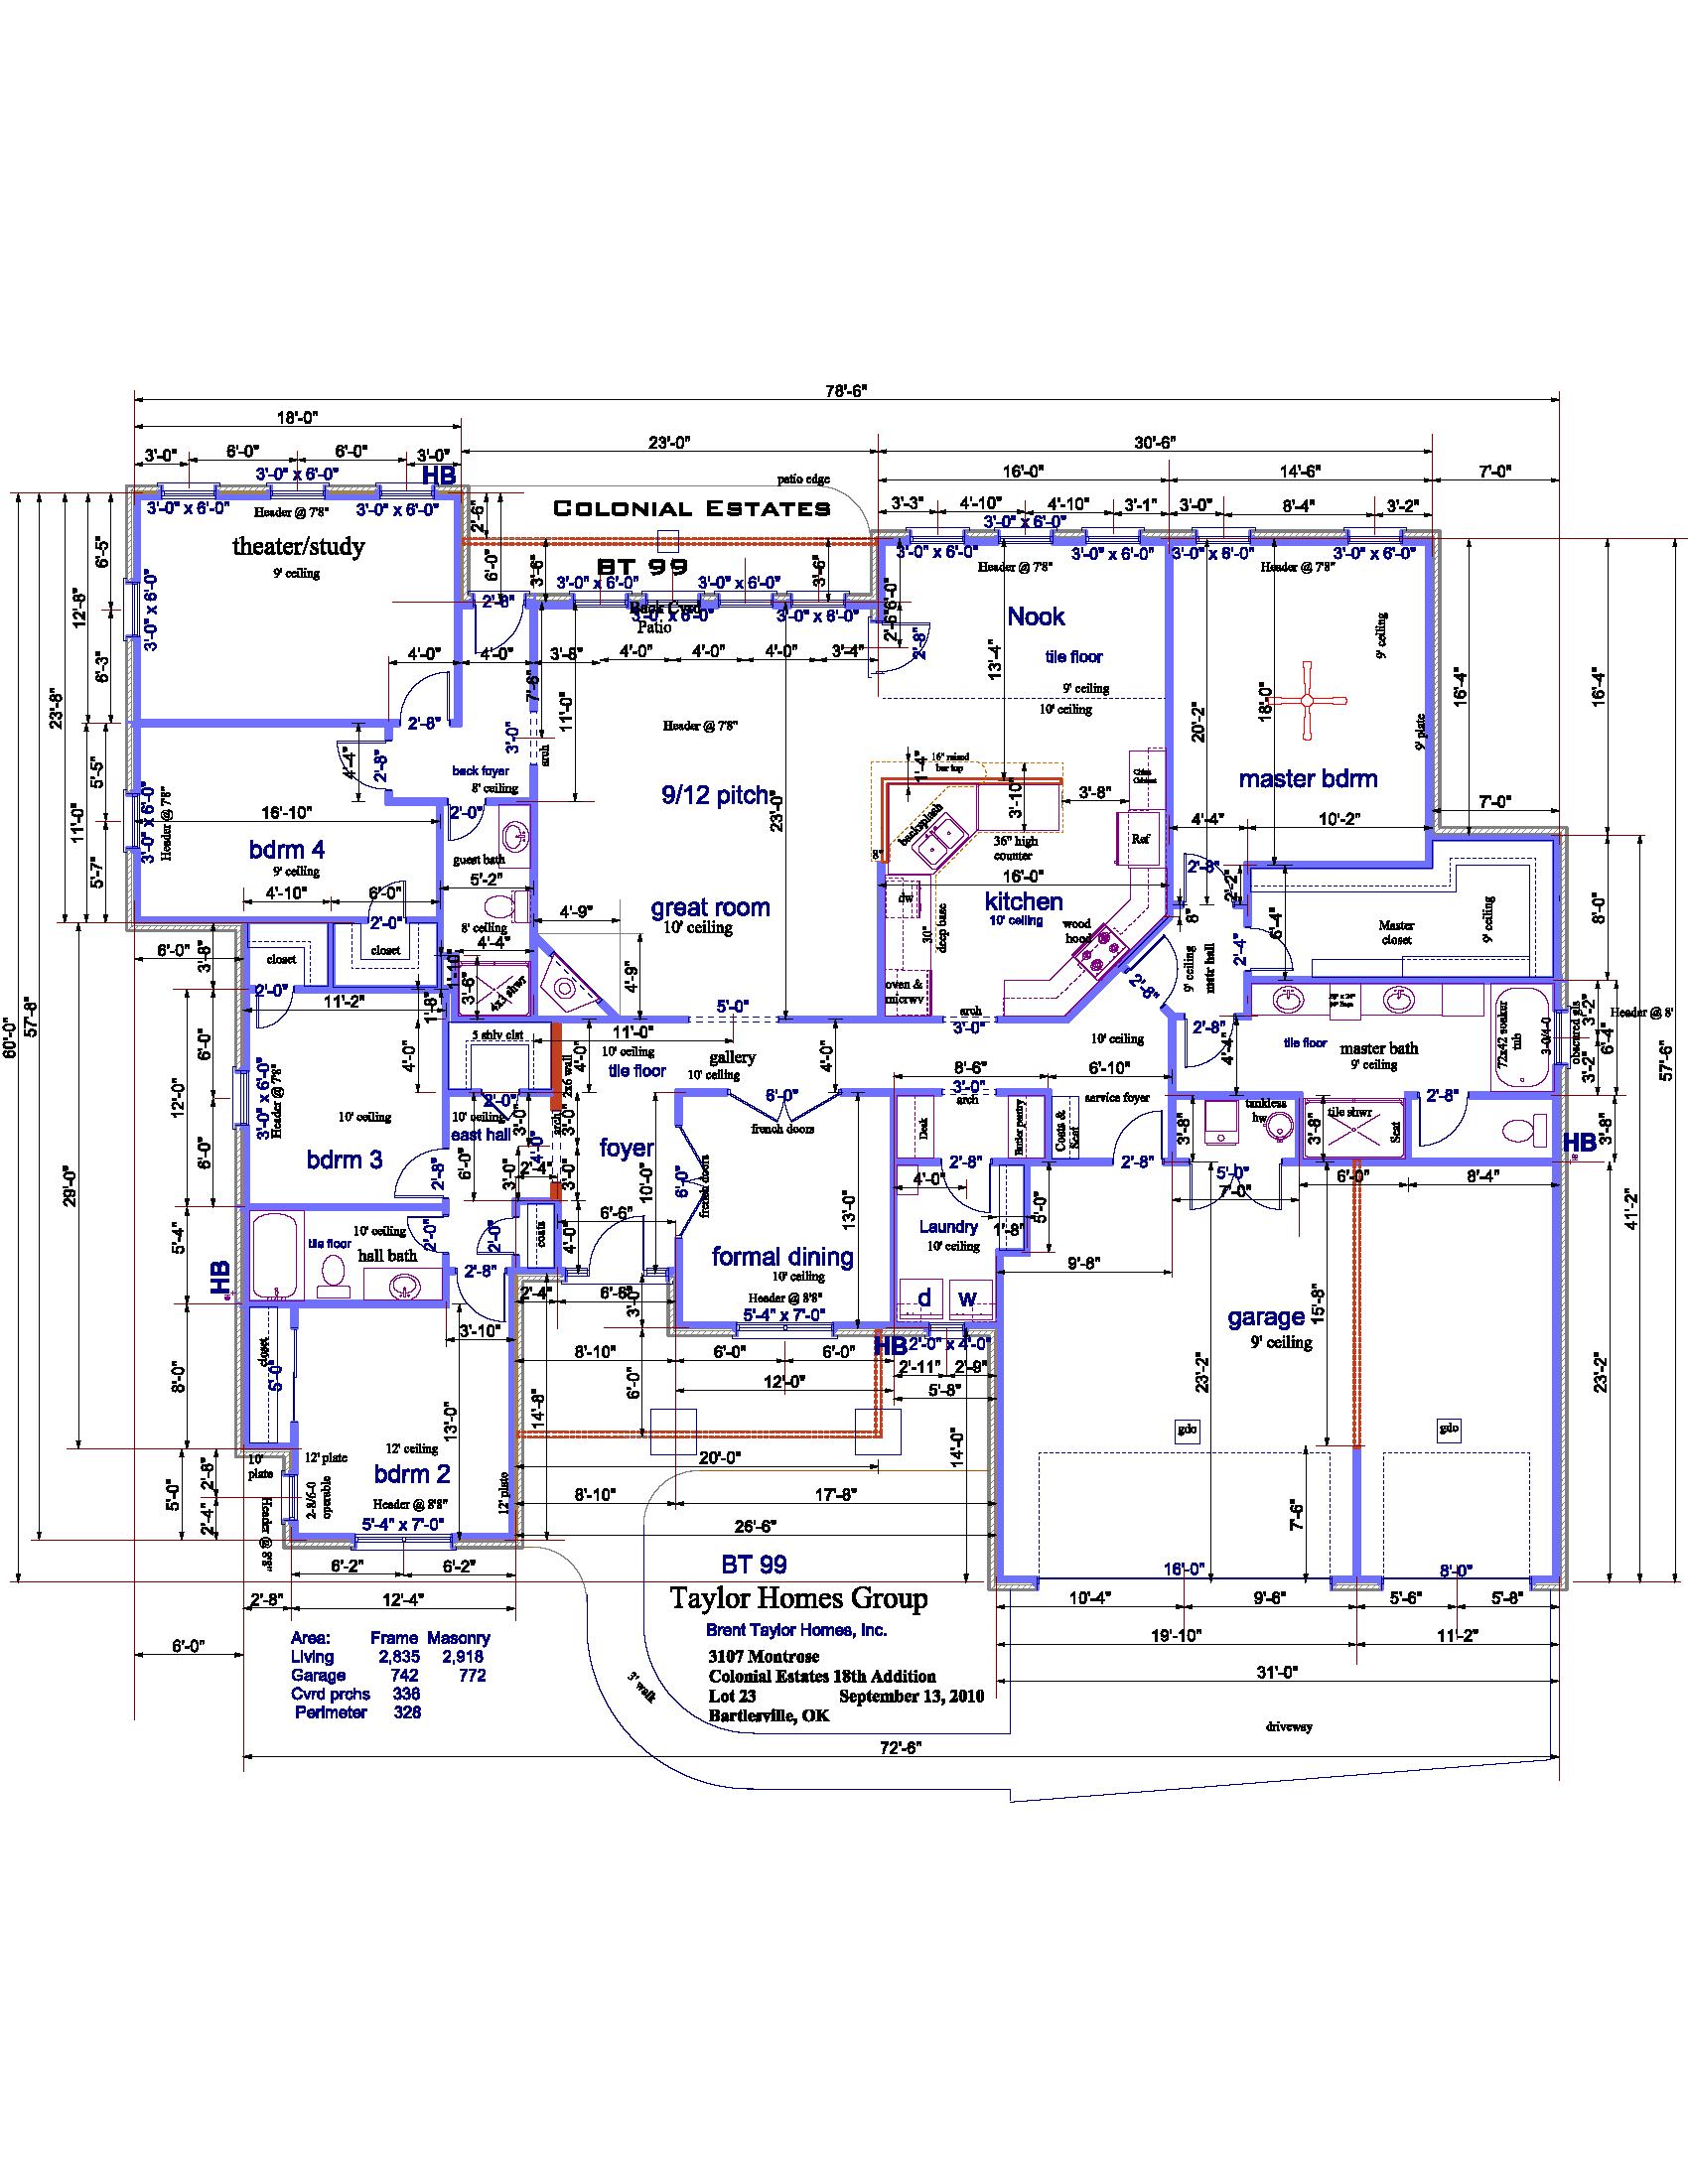 BT99 2918.png